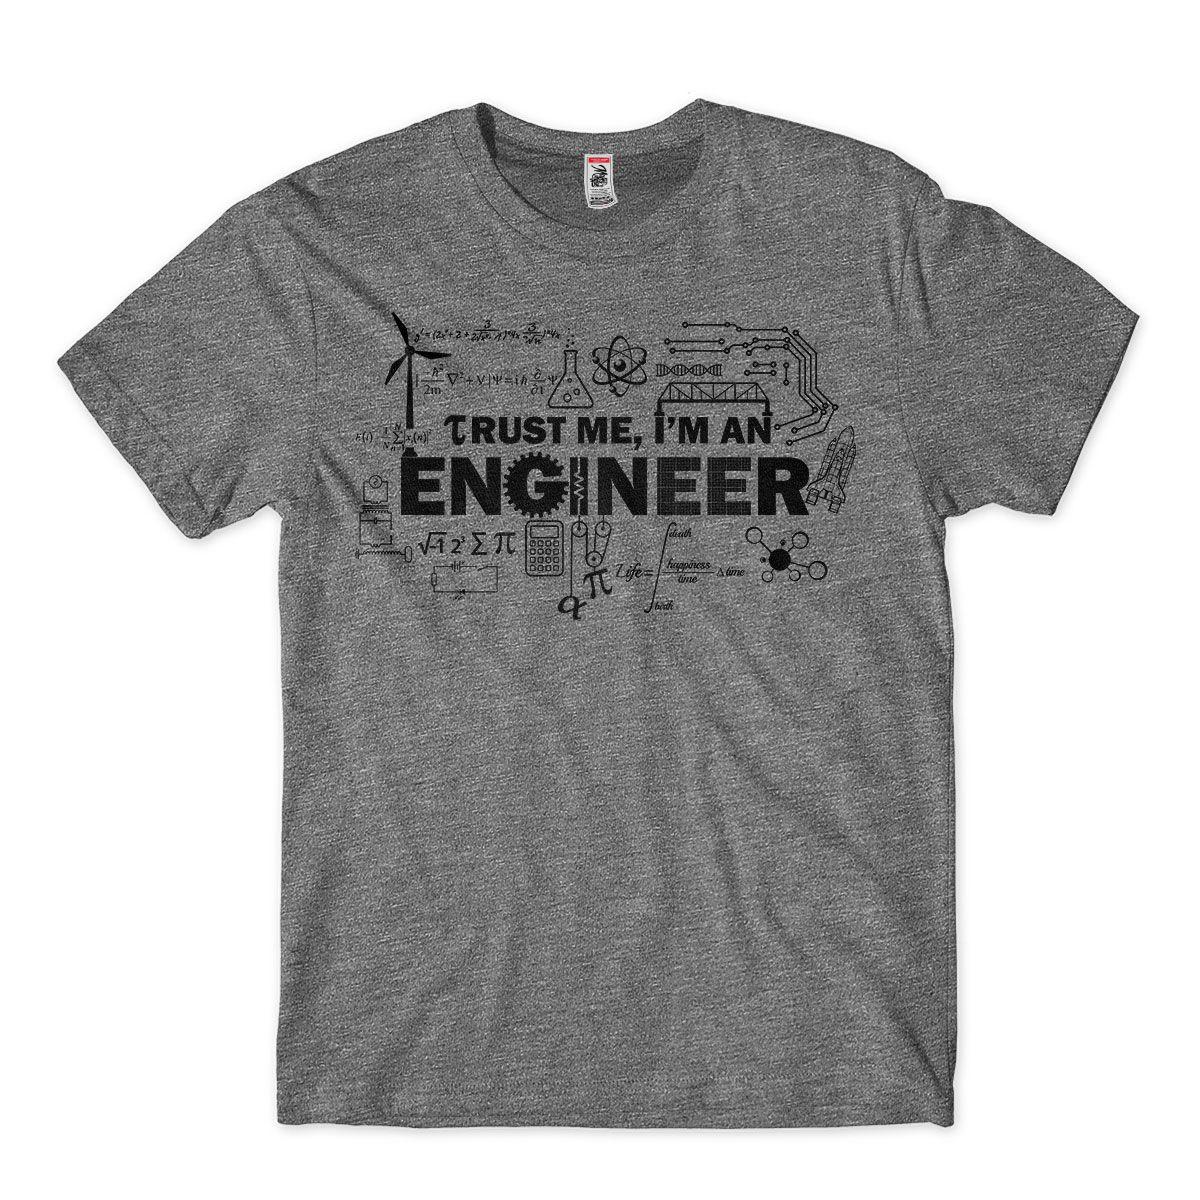 Camiseta Masculina Confie no Engenheiro Engracada